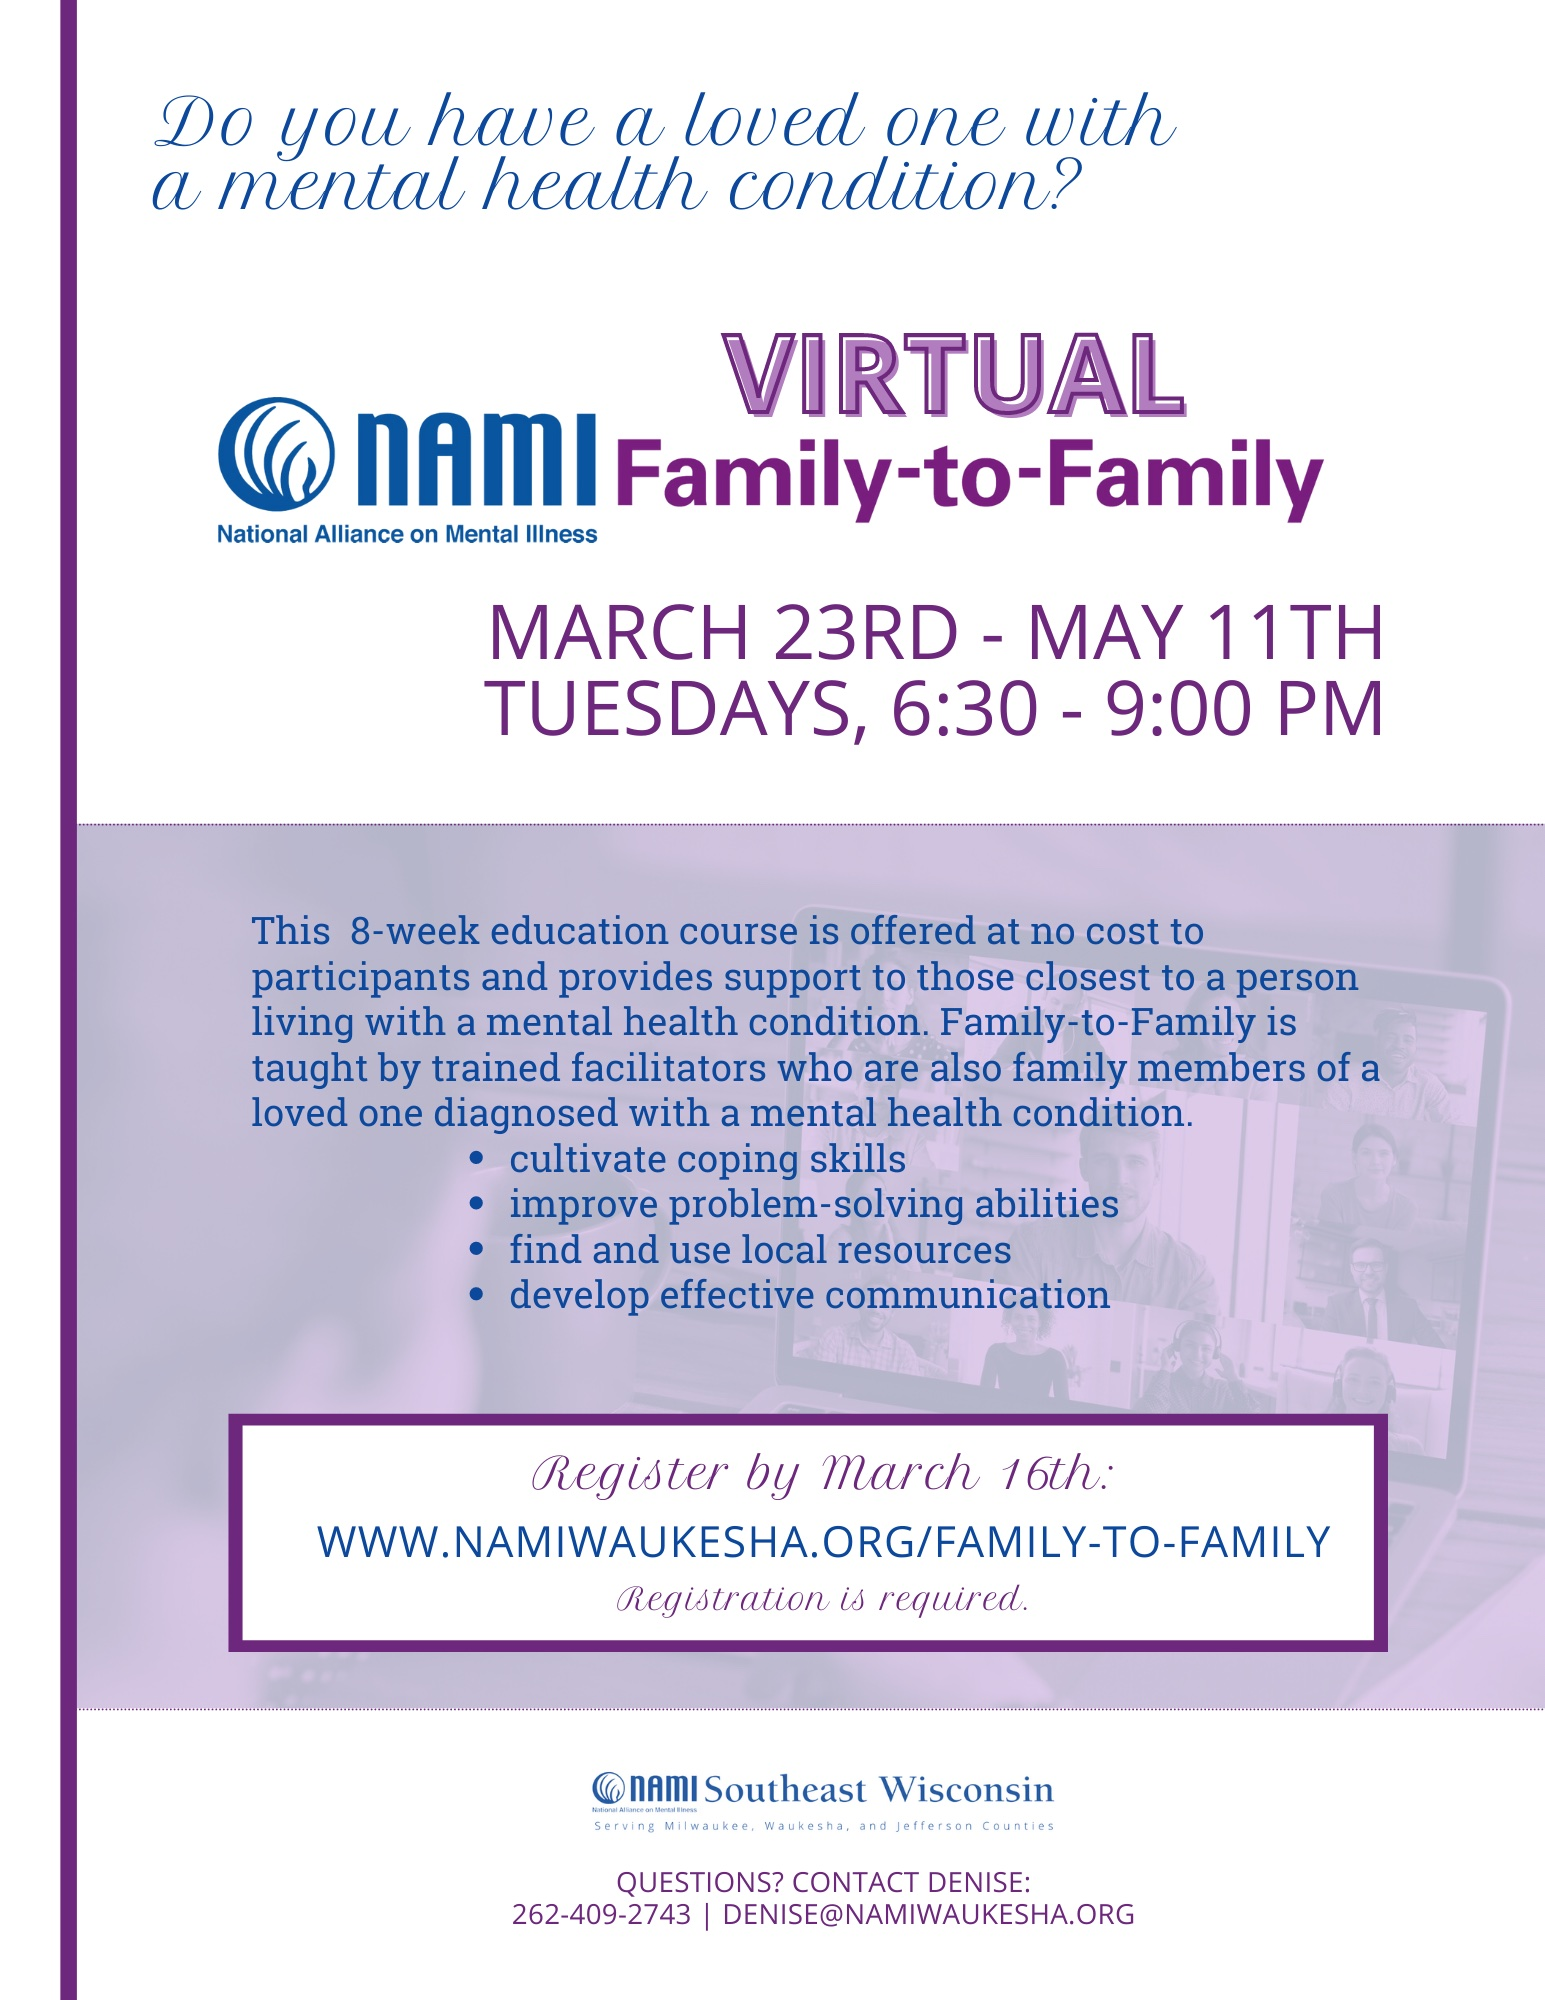 NAMI Virtual Family to Family Education Program